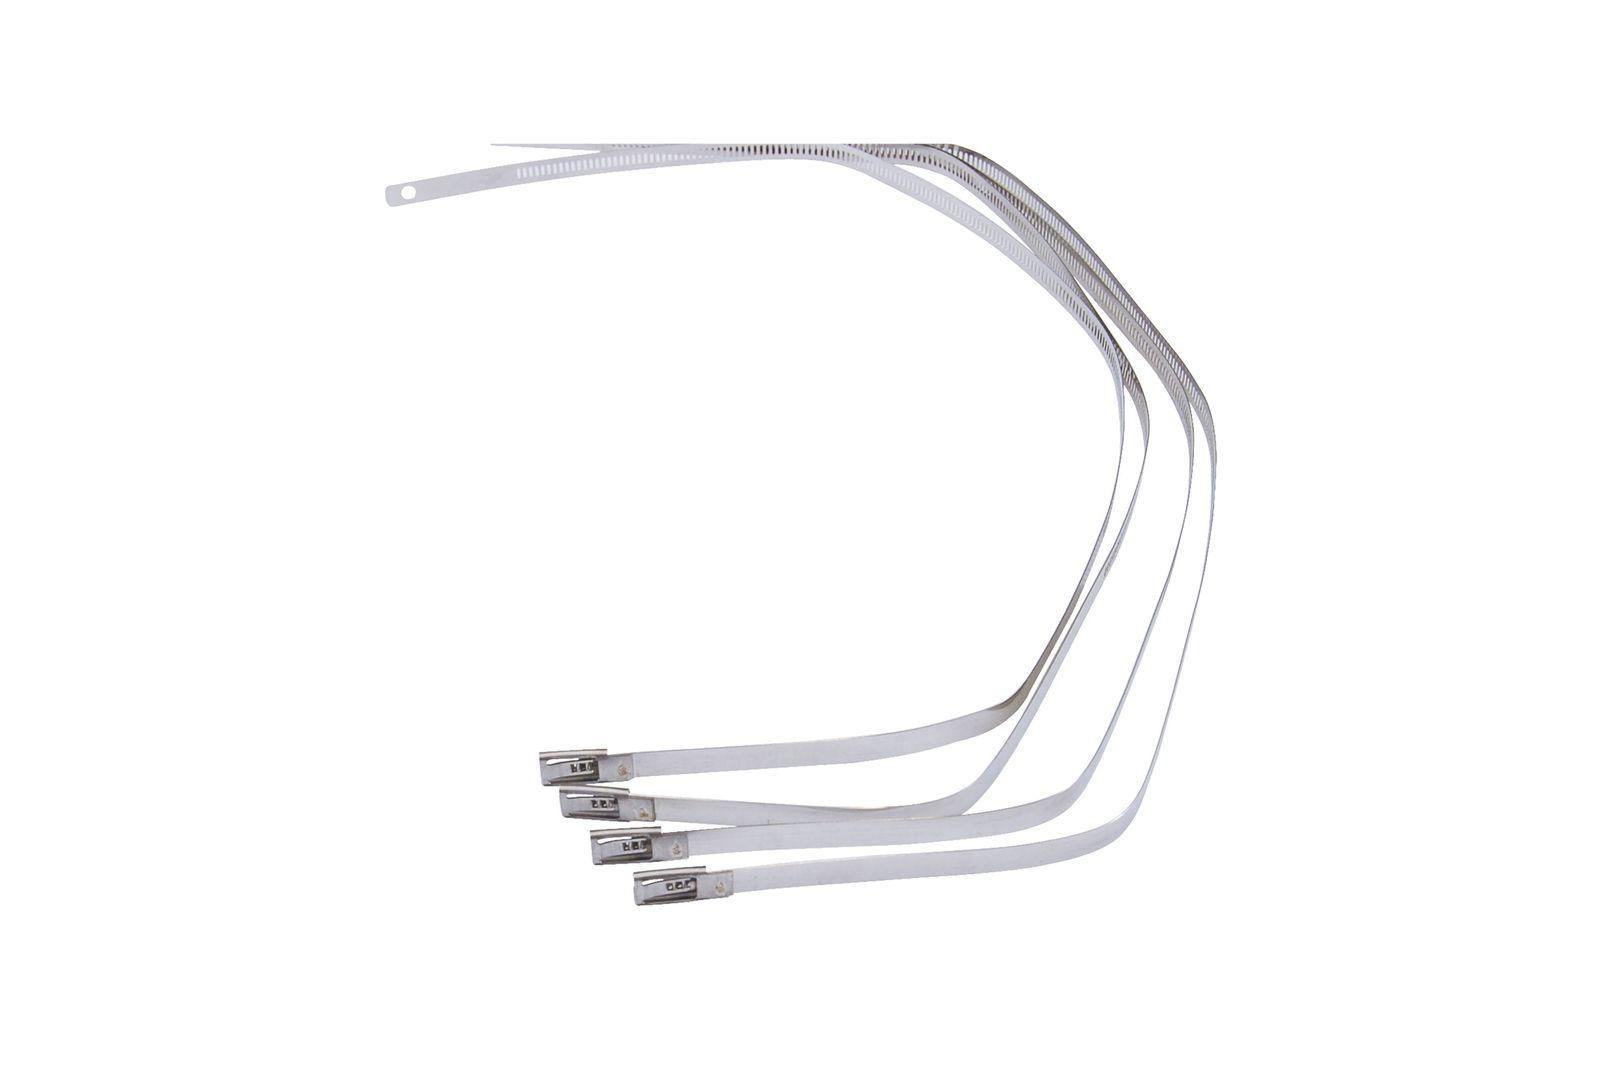 #Edelstahl Kabelbinder-Satz 6x 22,95 cm + 4x 45,72 cm, GAC0173